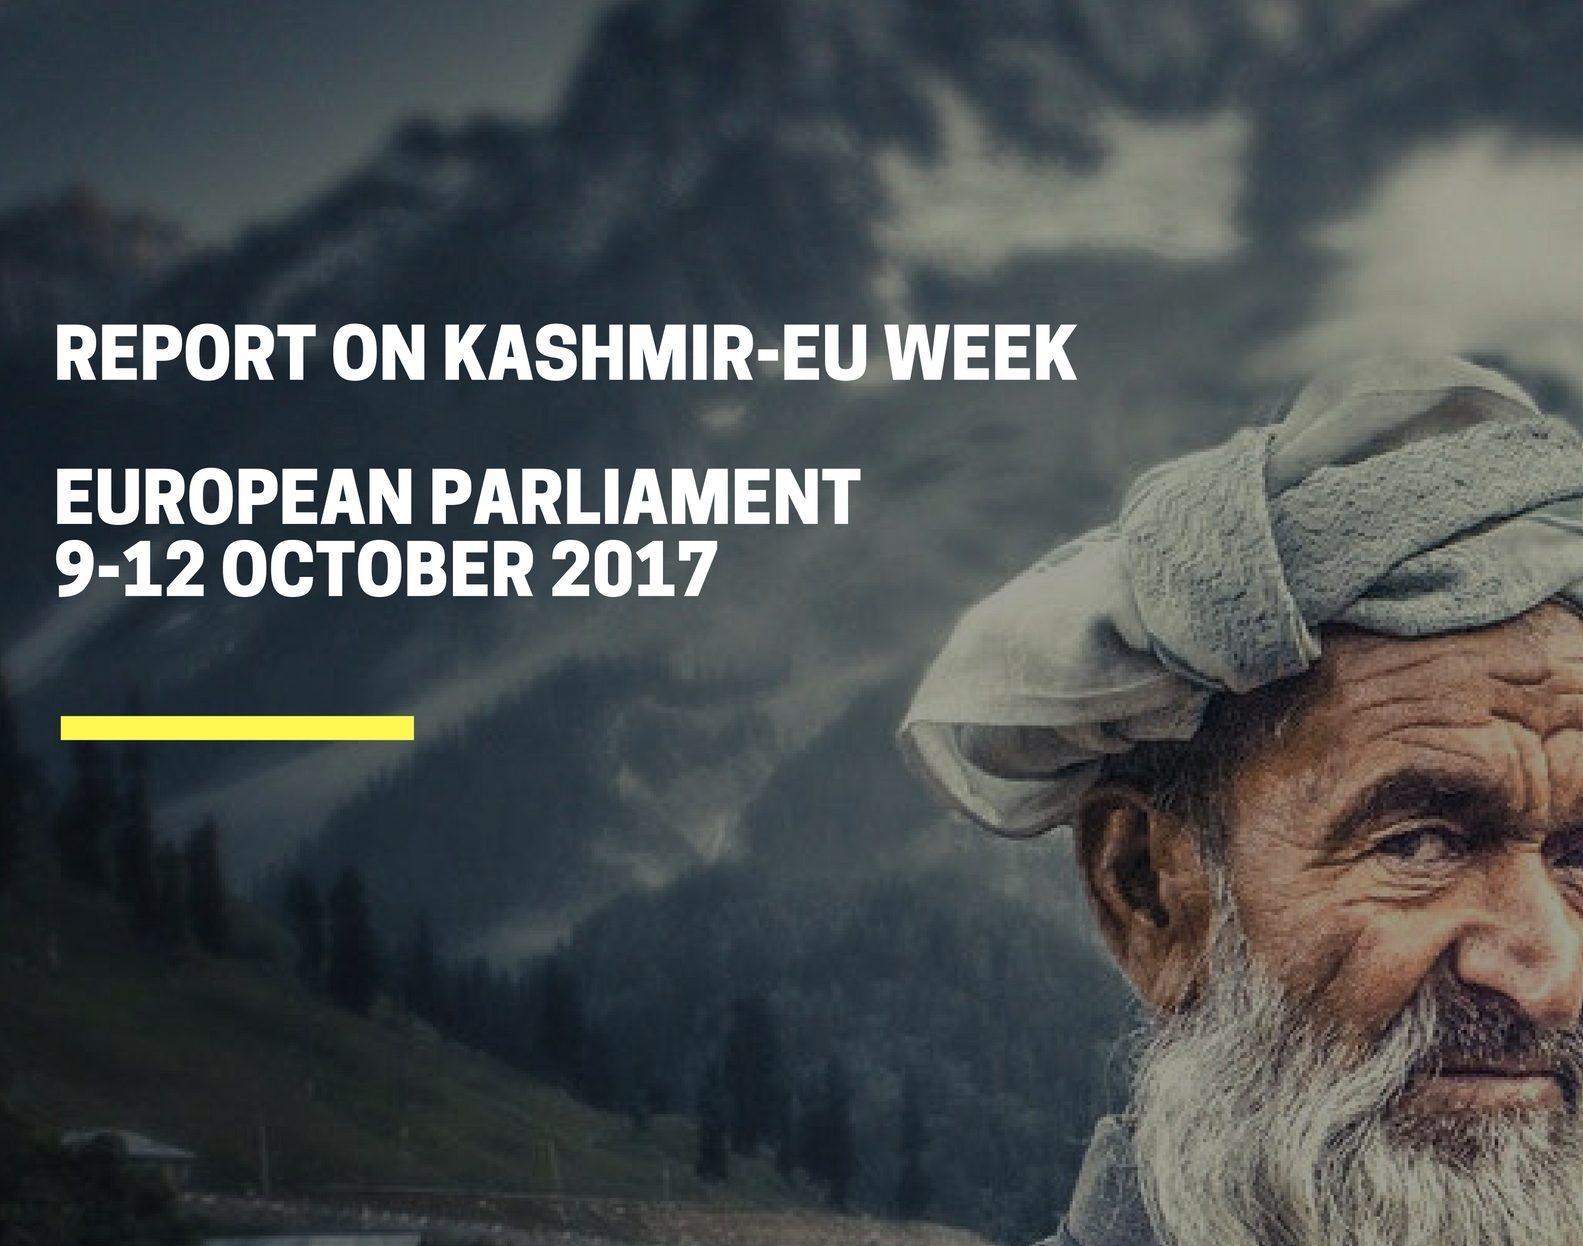 Kashmir-EU Week 2017